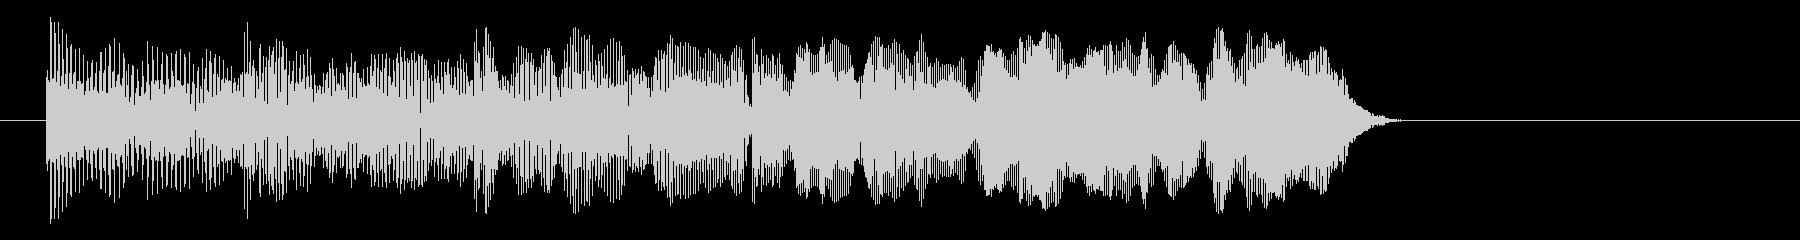 8bitパワーup-01-2_dryの未再生の波形